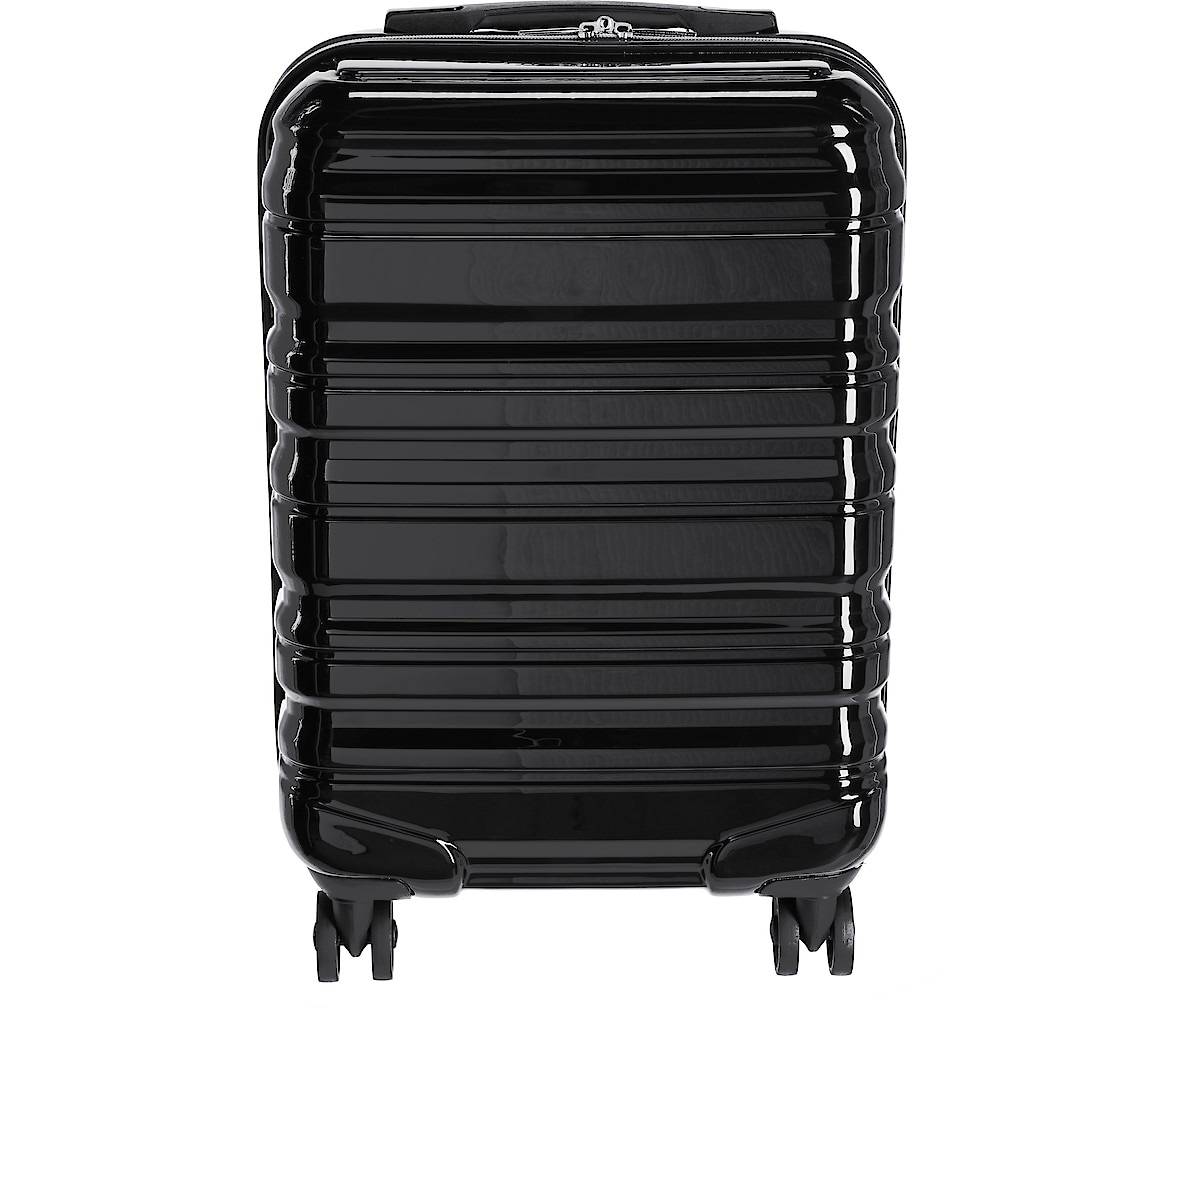 2 Piece Luggage Set Asaklitt